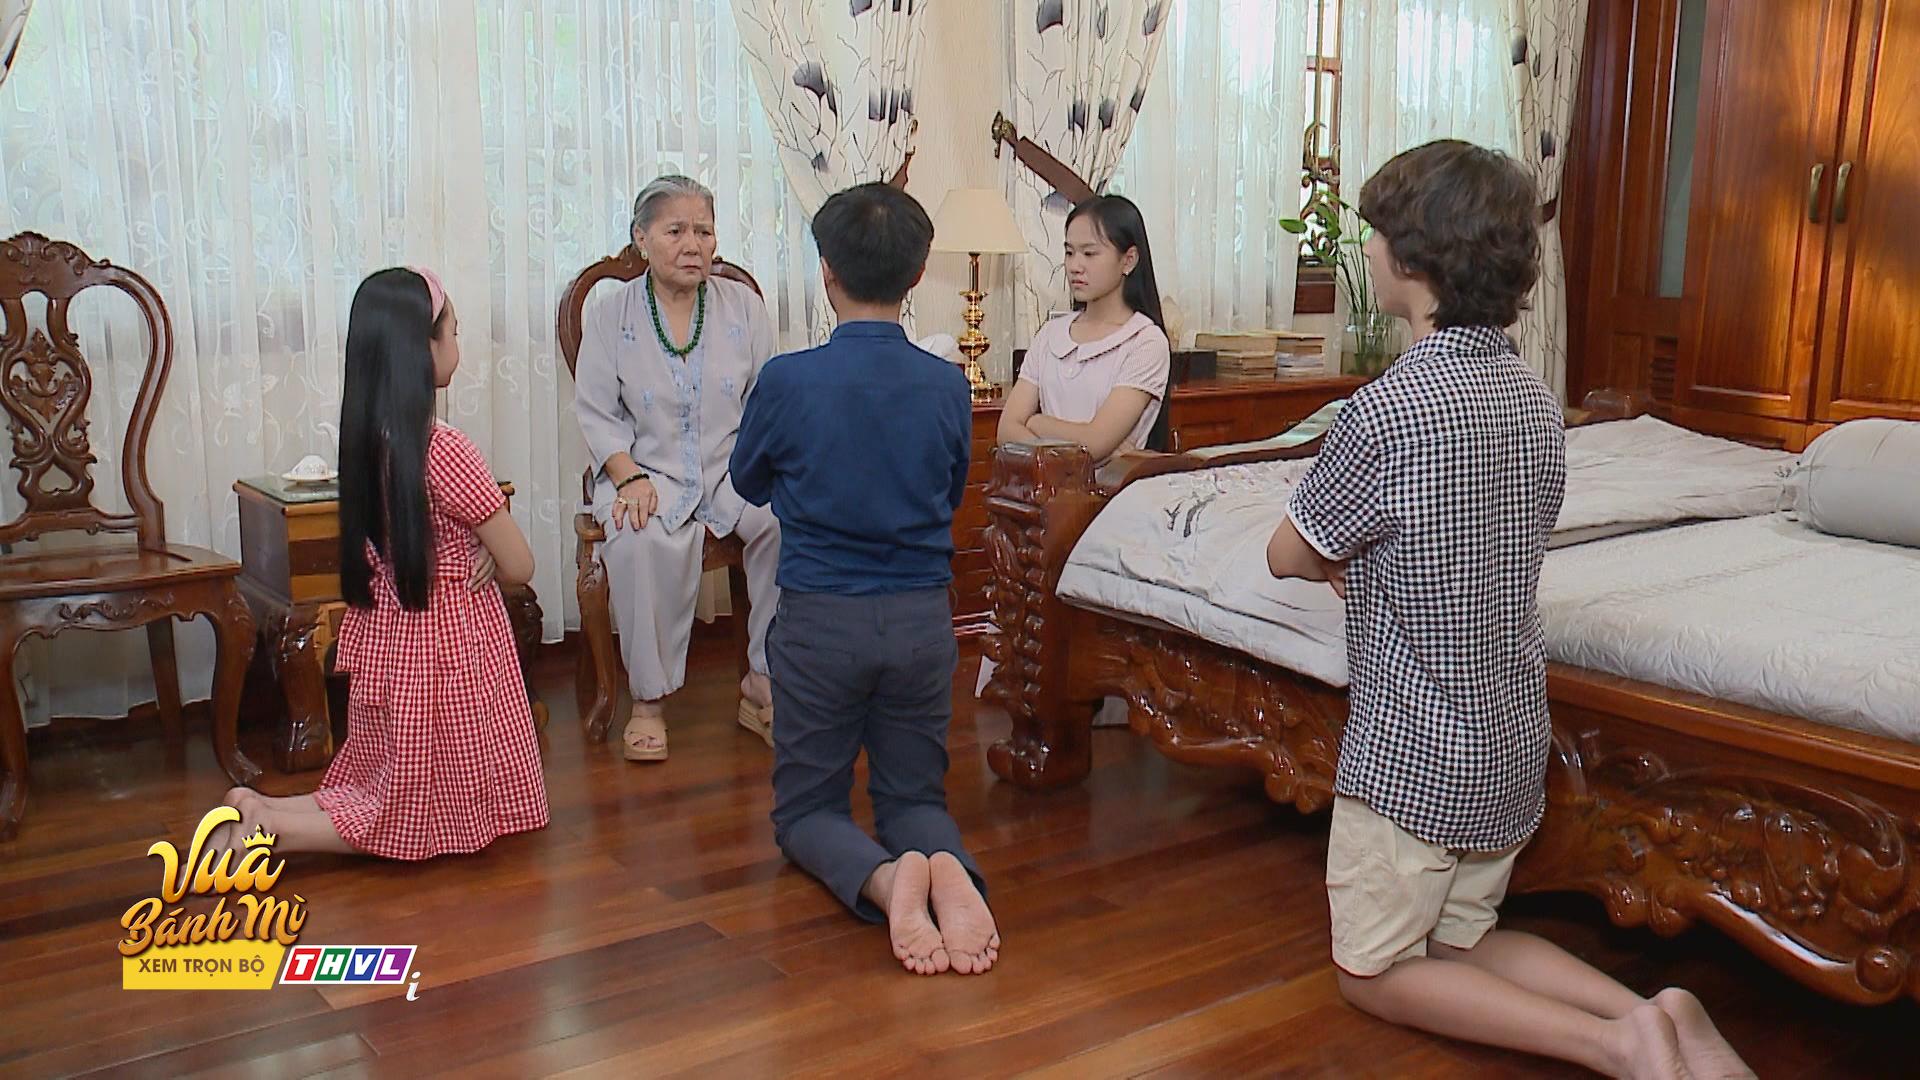 Phim-vua-banh-mi-Viet-Nam-tap-cuoi-ket-thuc-nhu-the-nao